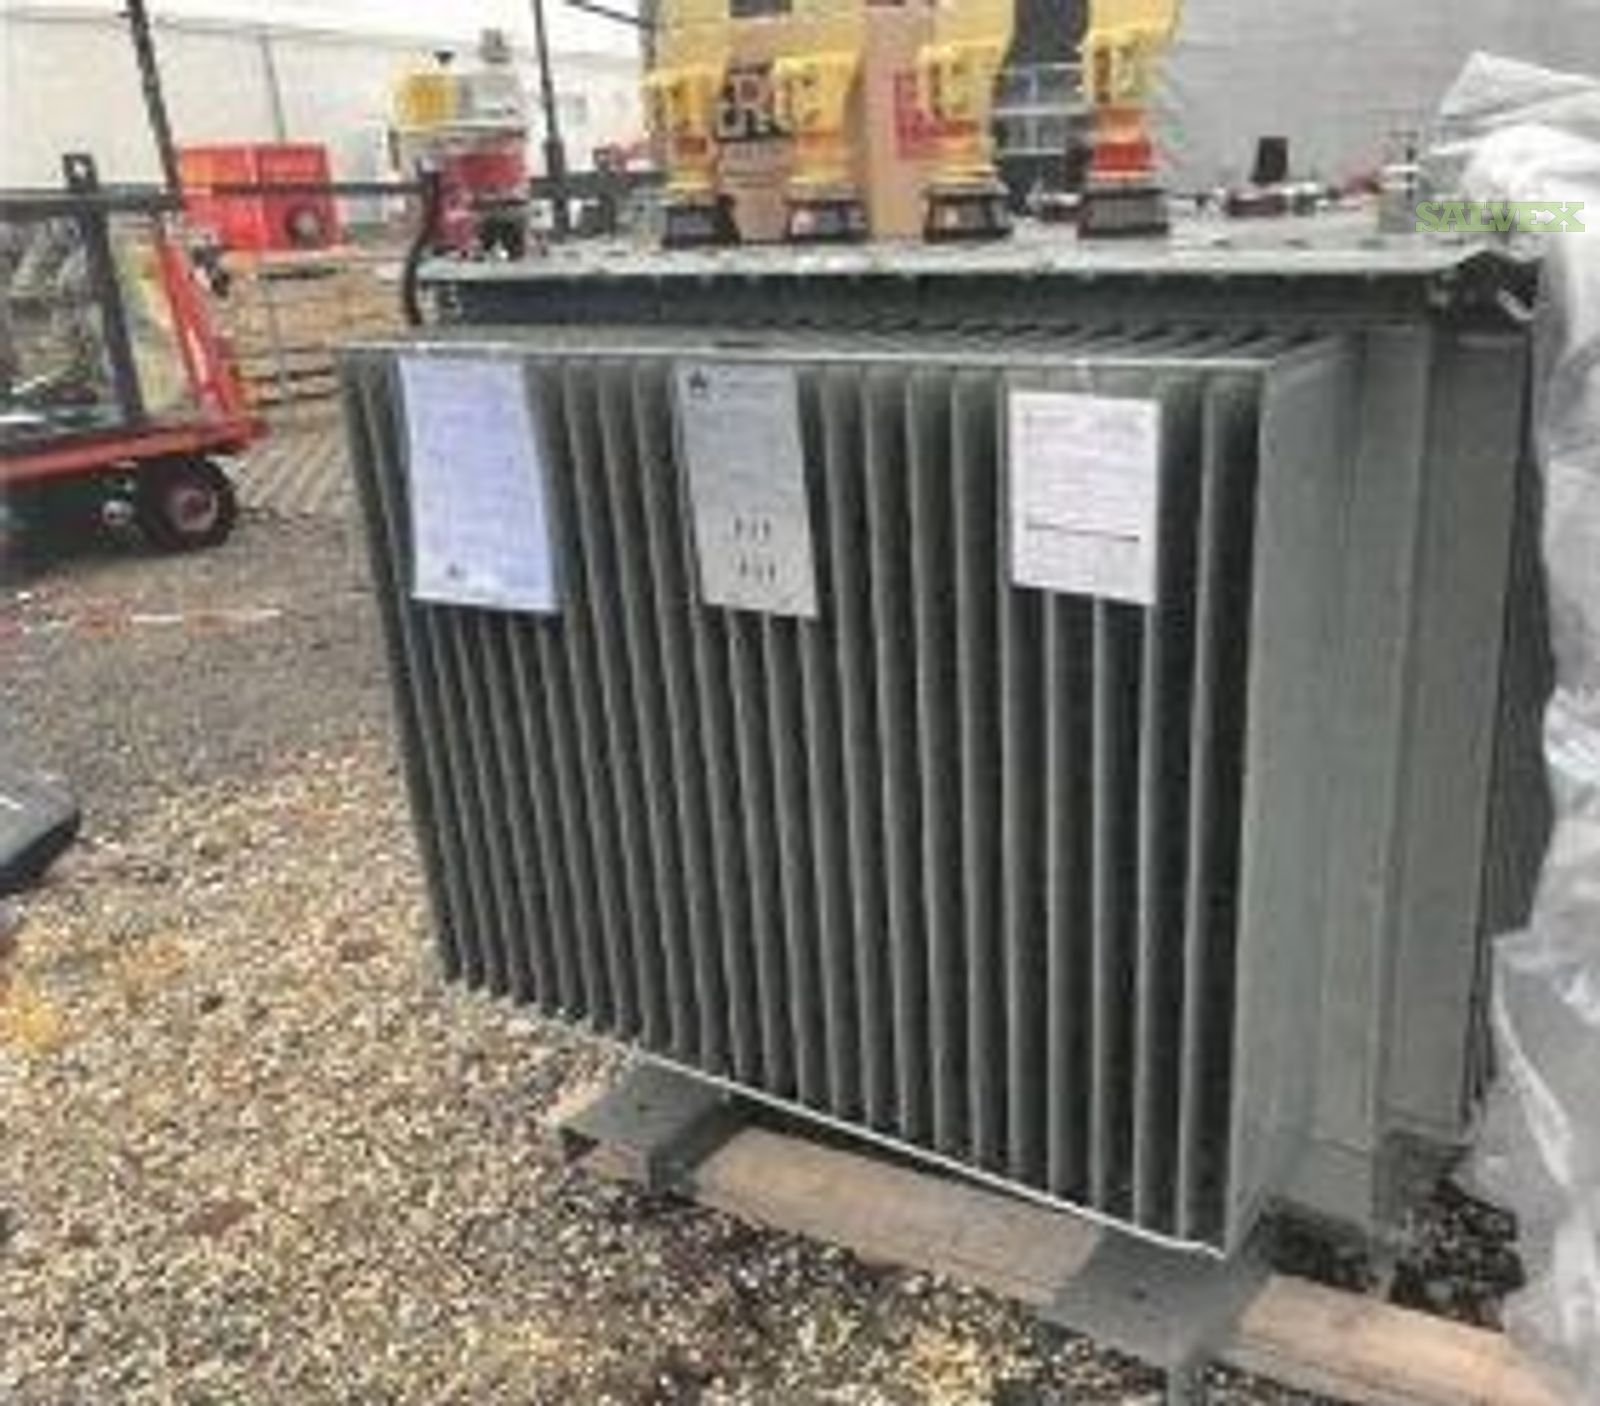 Astor 800KVA & 630 KVA Transformer Damaged (2 Units)